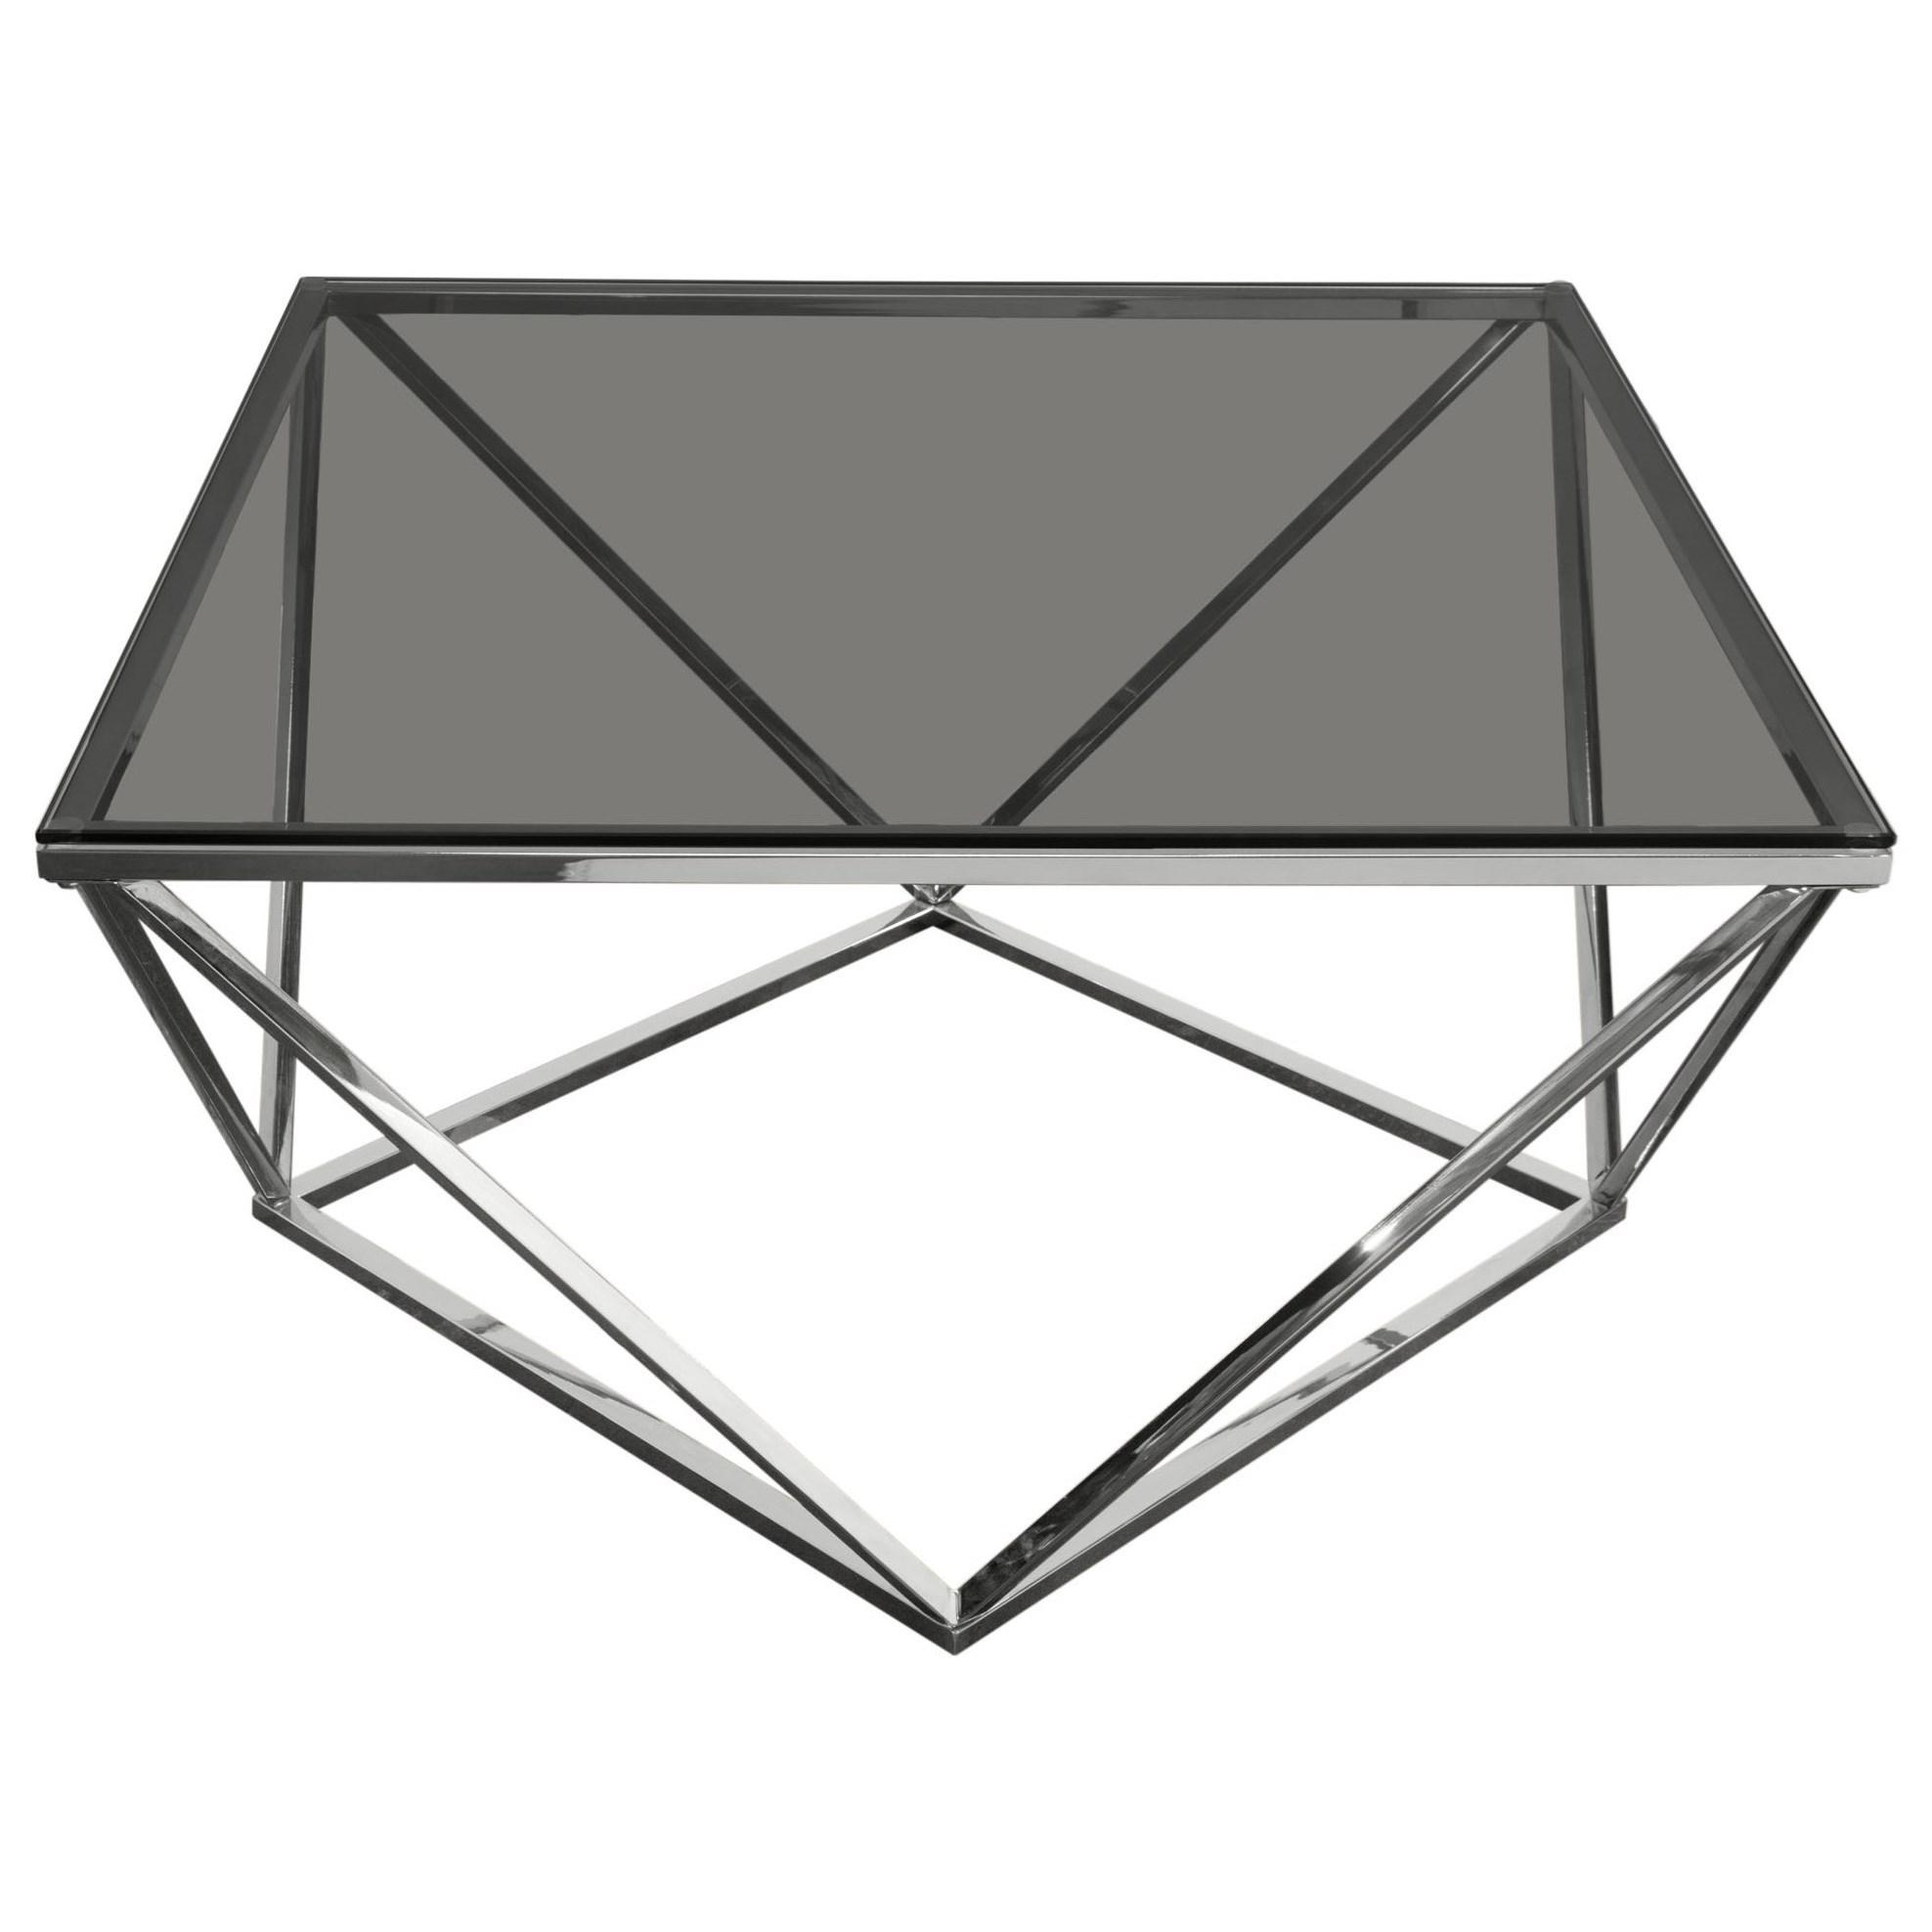 Gem Cocktail Table by Diamond Sofa at HomeWorld Furniture